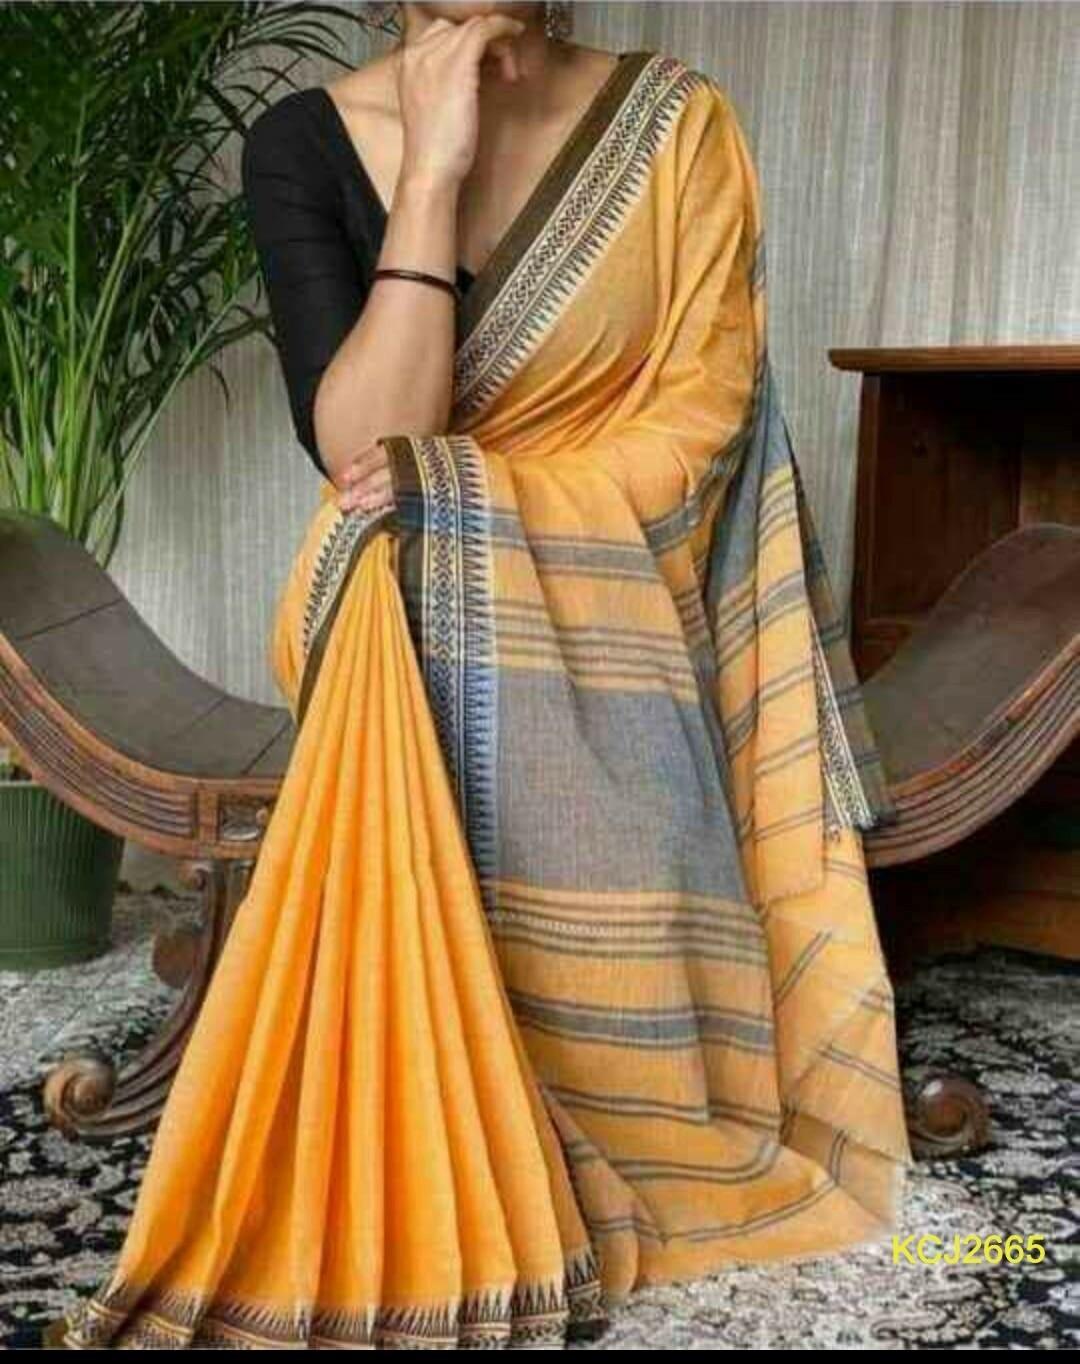 Handloom Cotton Khadi saree with jacquard weaving